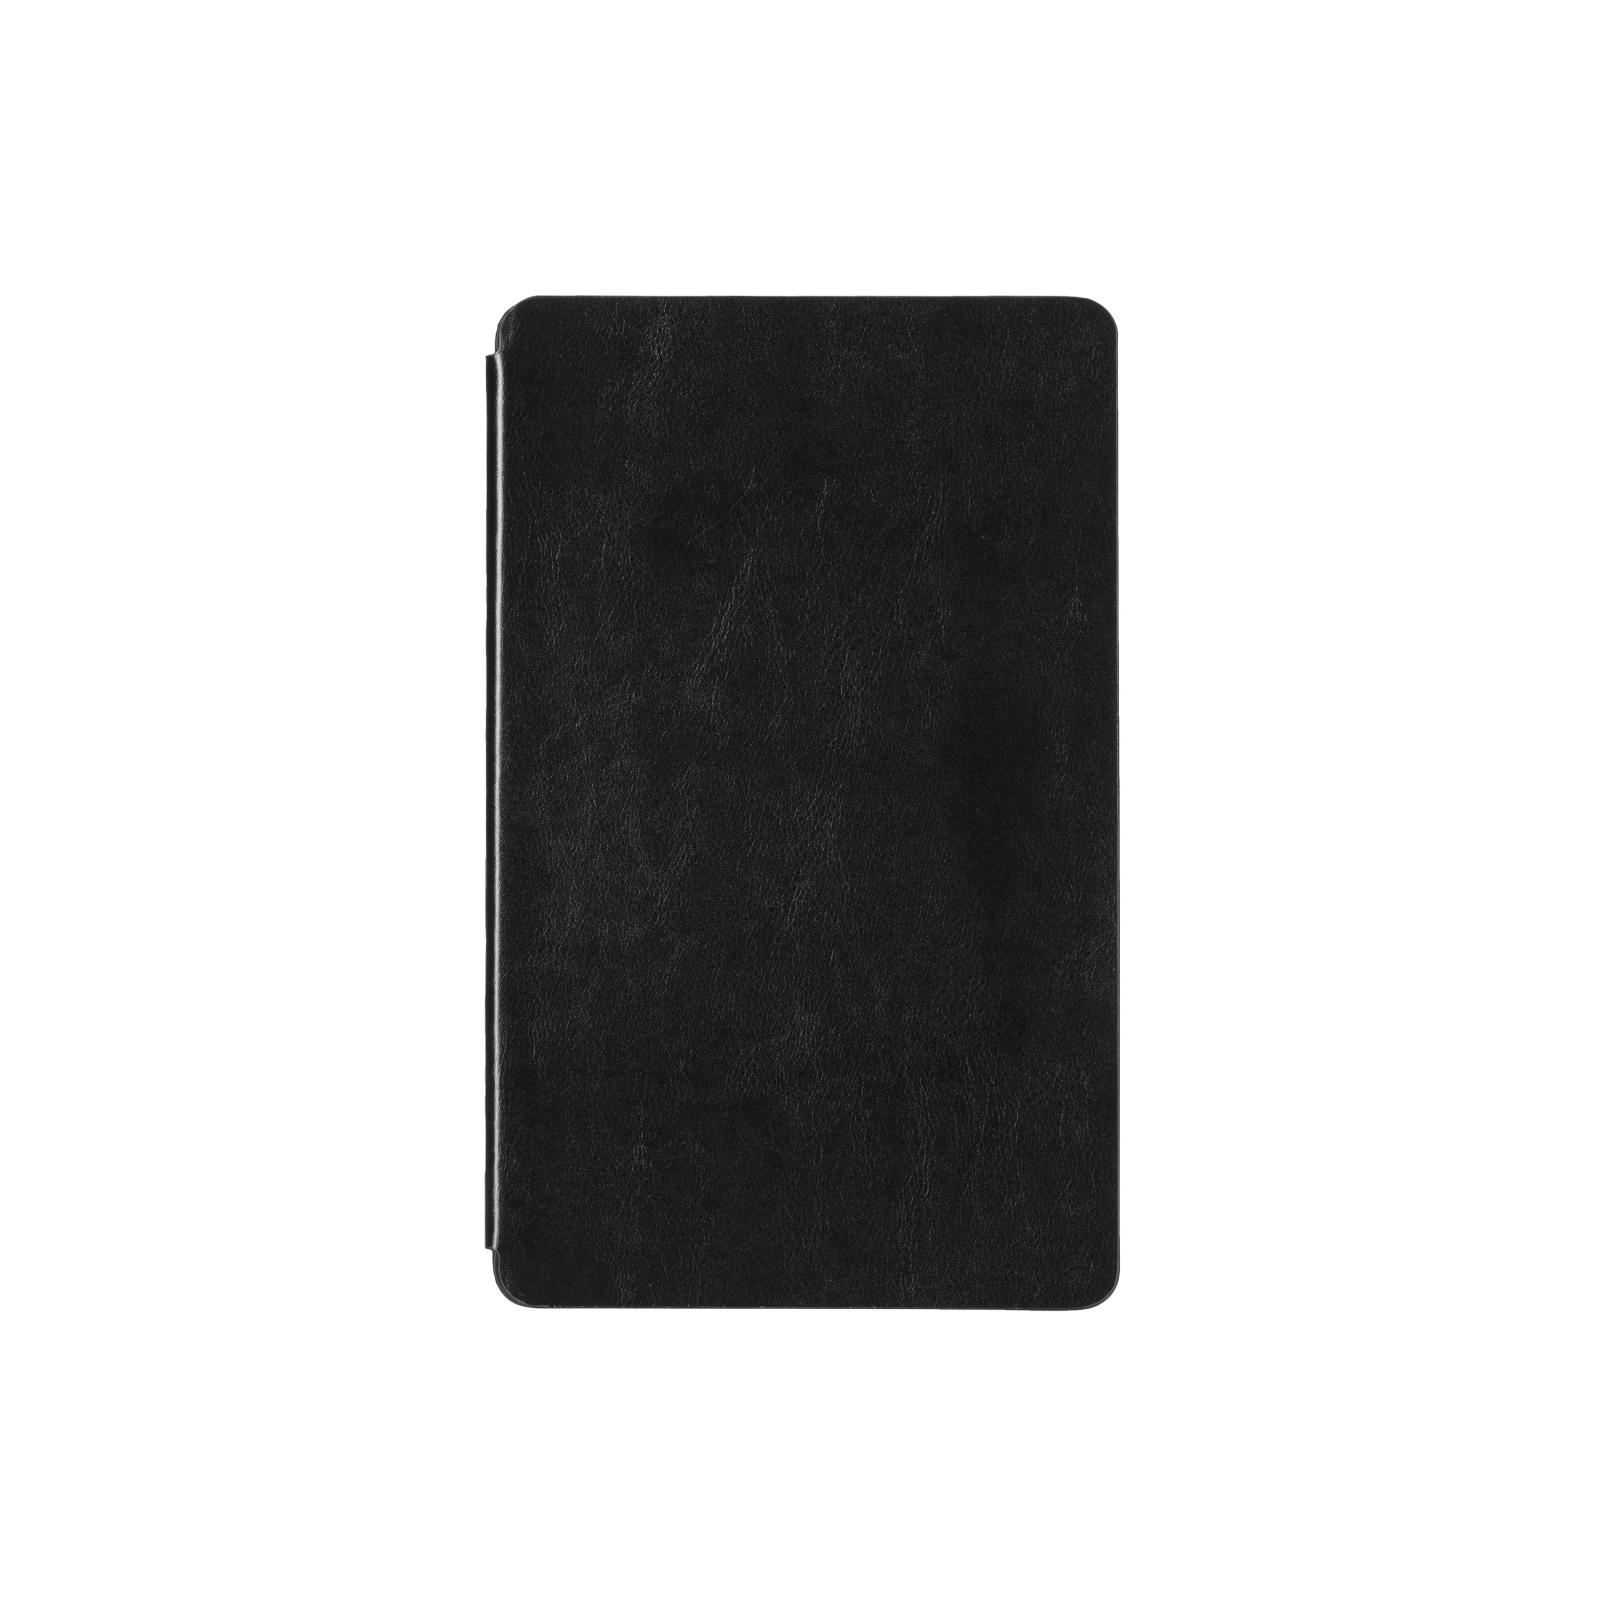 Чохол до планшета 2E Samsung Galaxy Tab S6, Retro, Black (2E-G-S6-IKRT-BK)